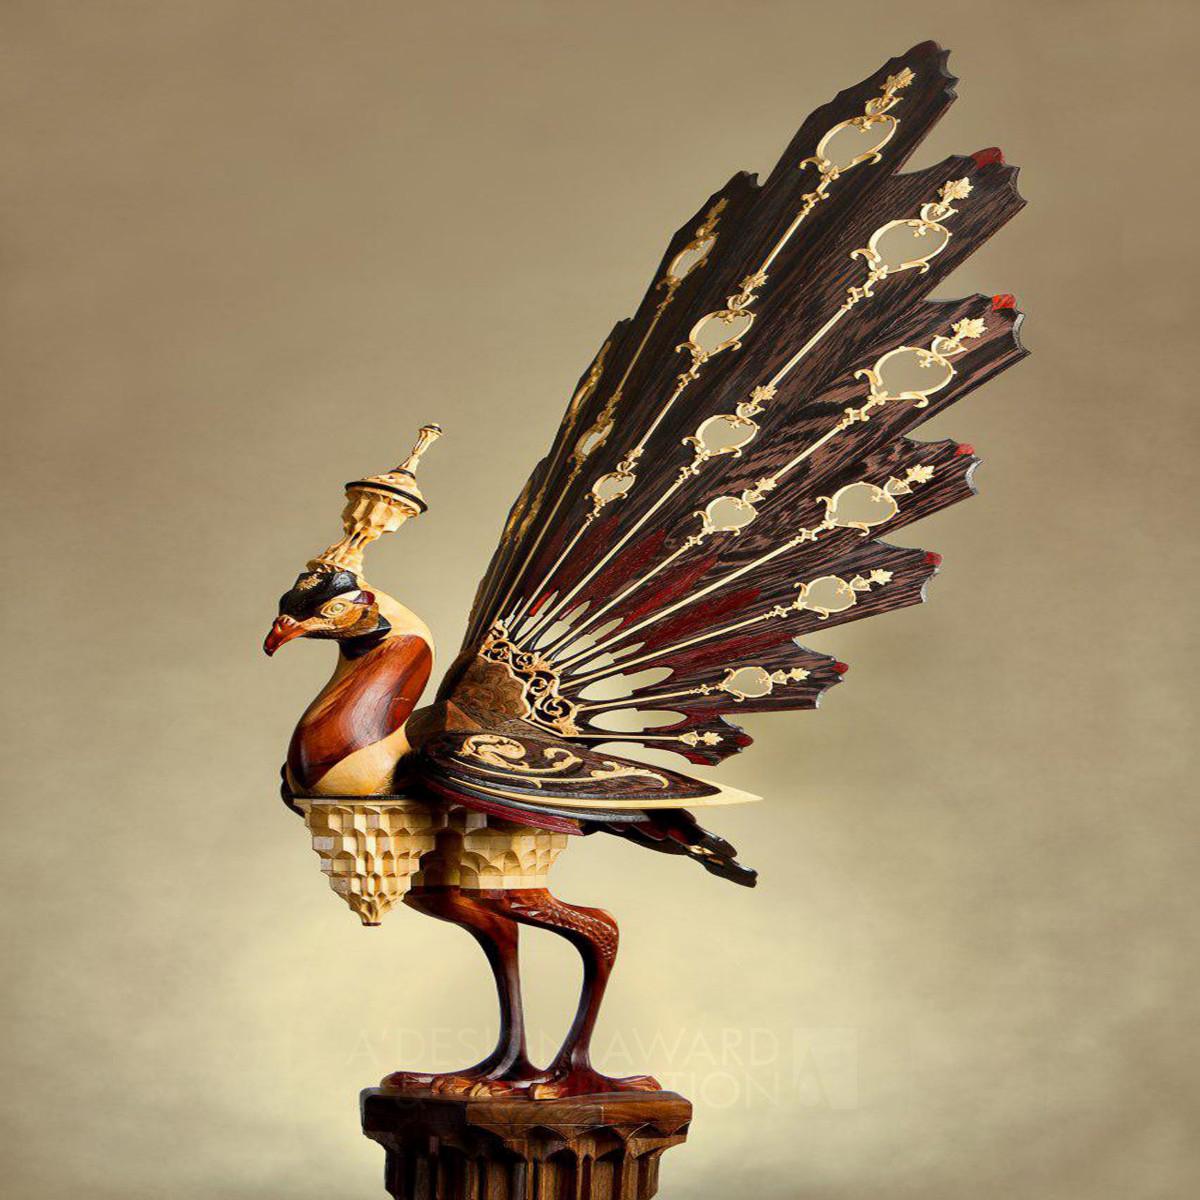 The Bird from Paradise Wooden Sculpture